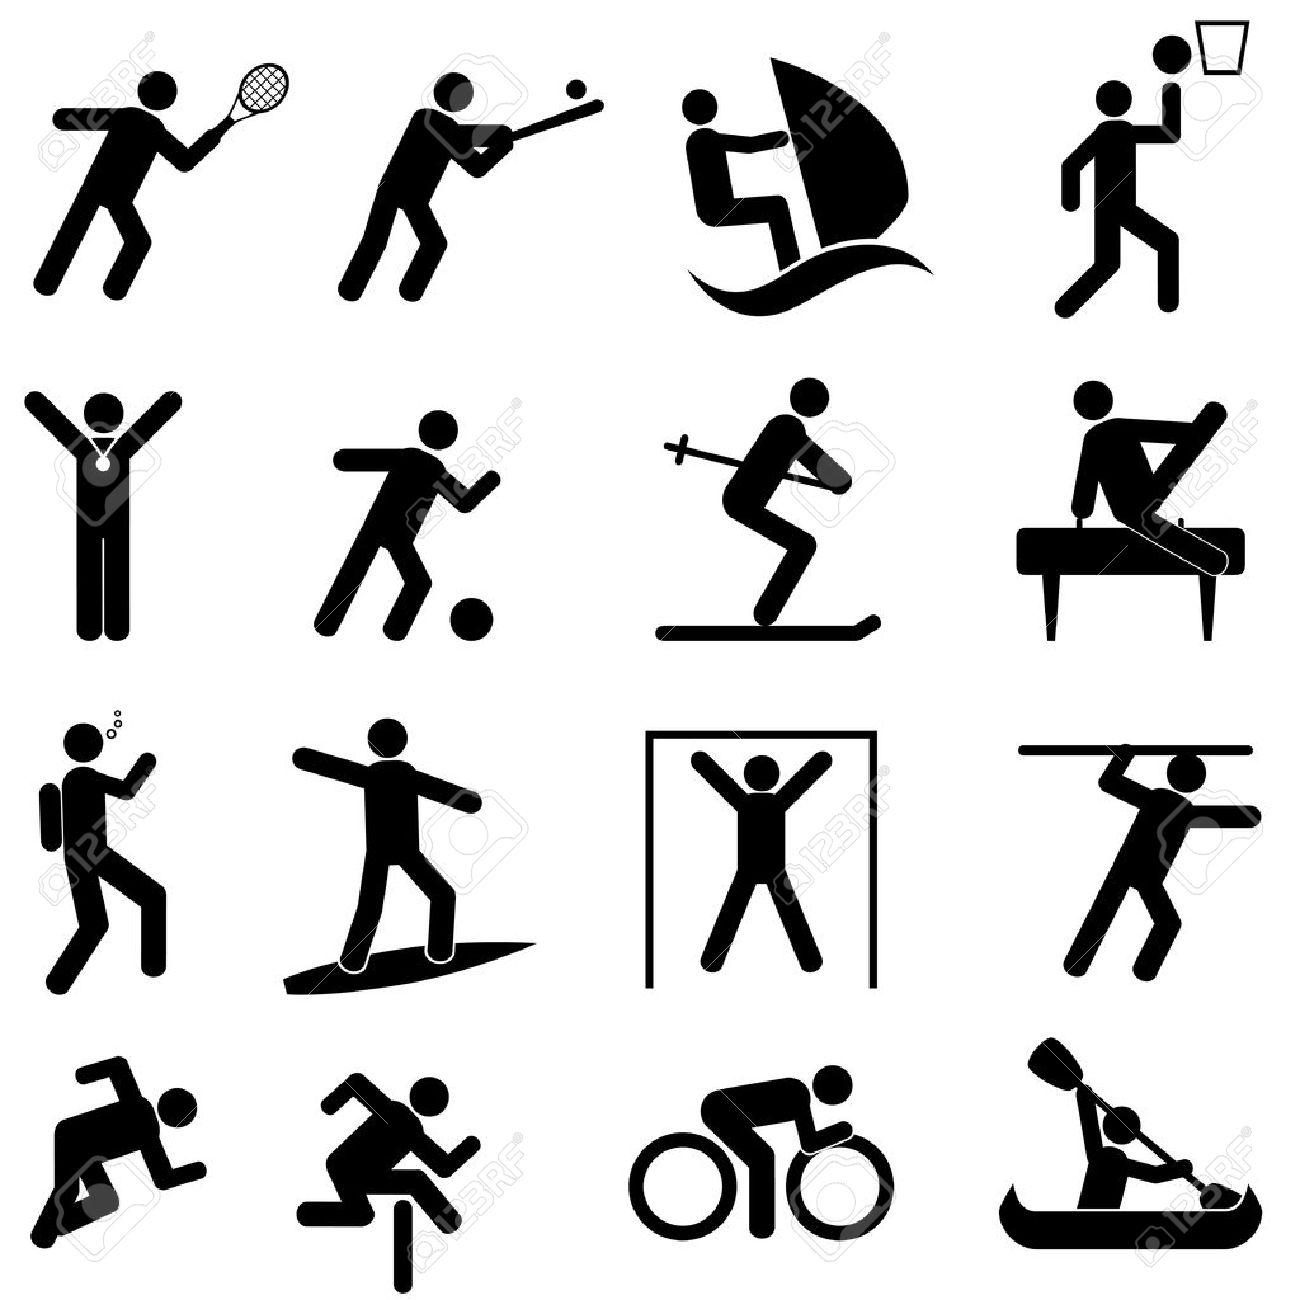 Sports and athletics icon set - 19877810